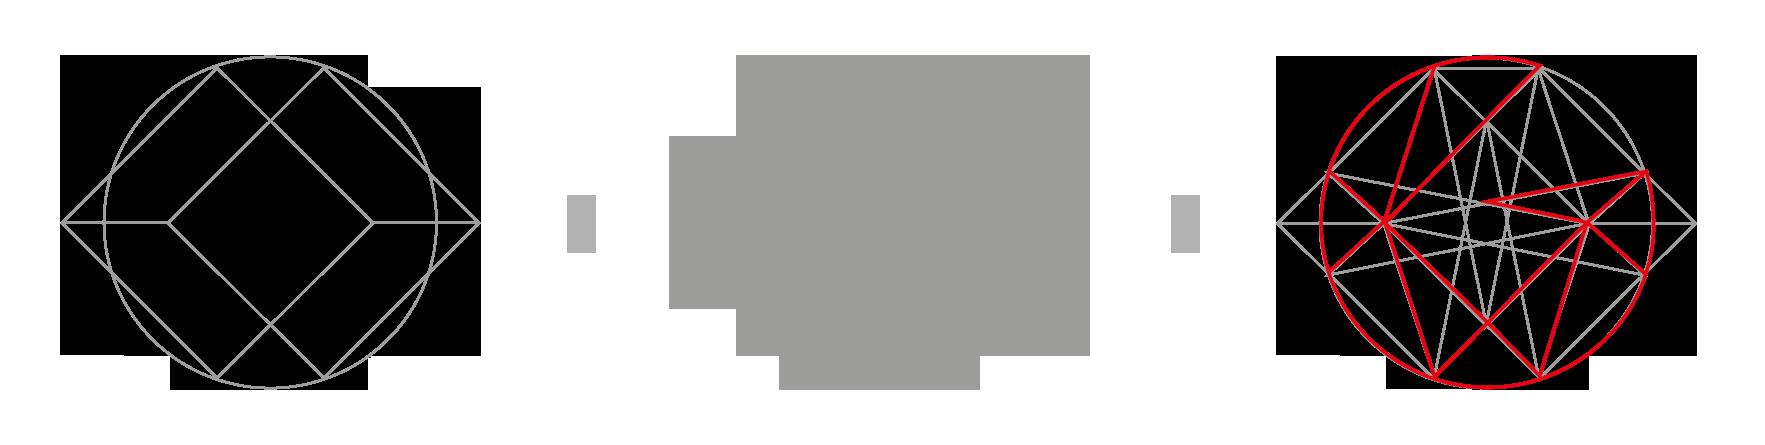 geodesis-costruzione-pittogramma